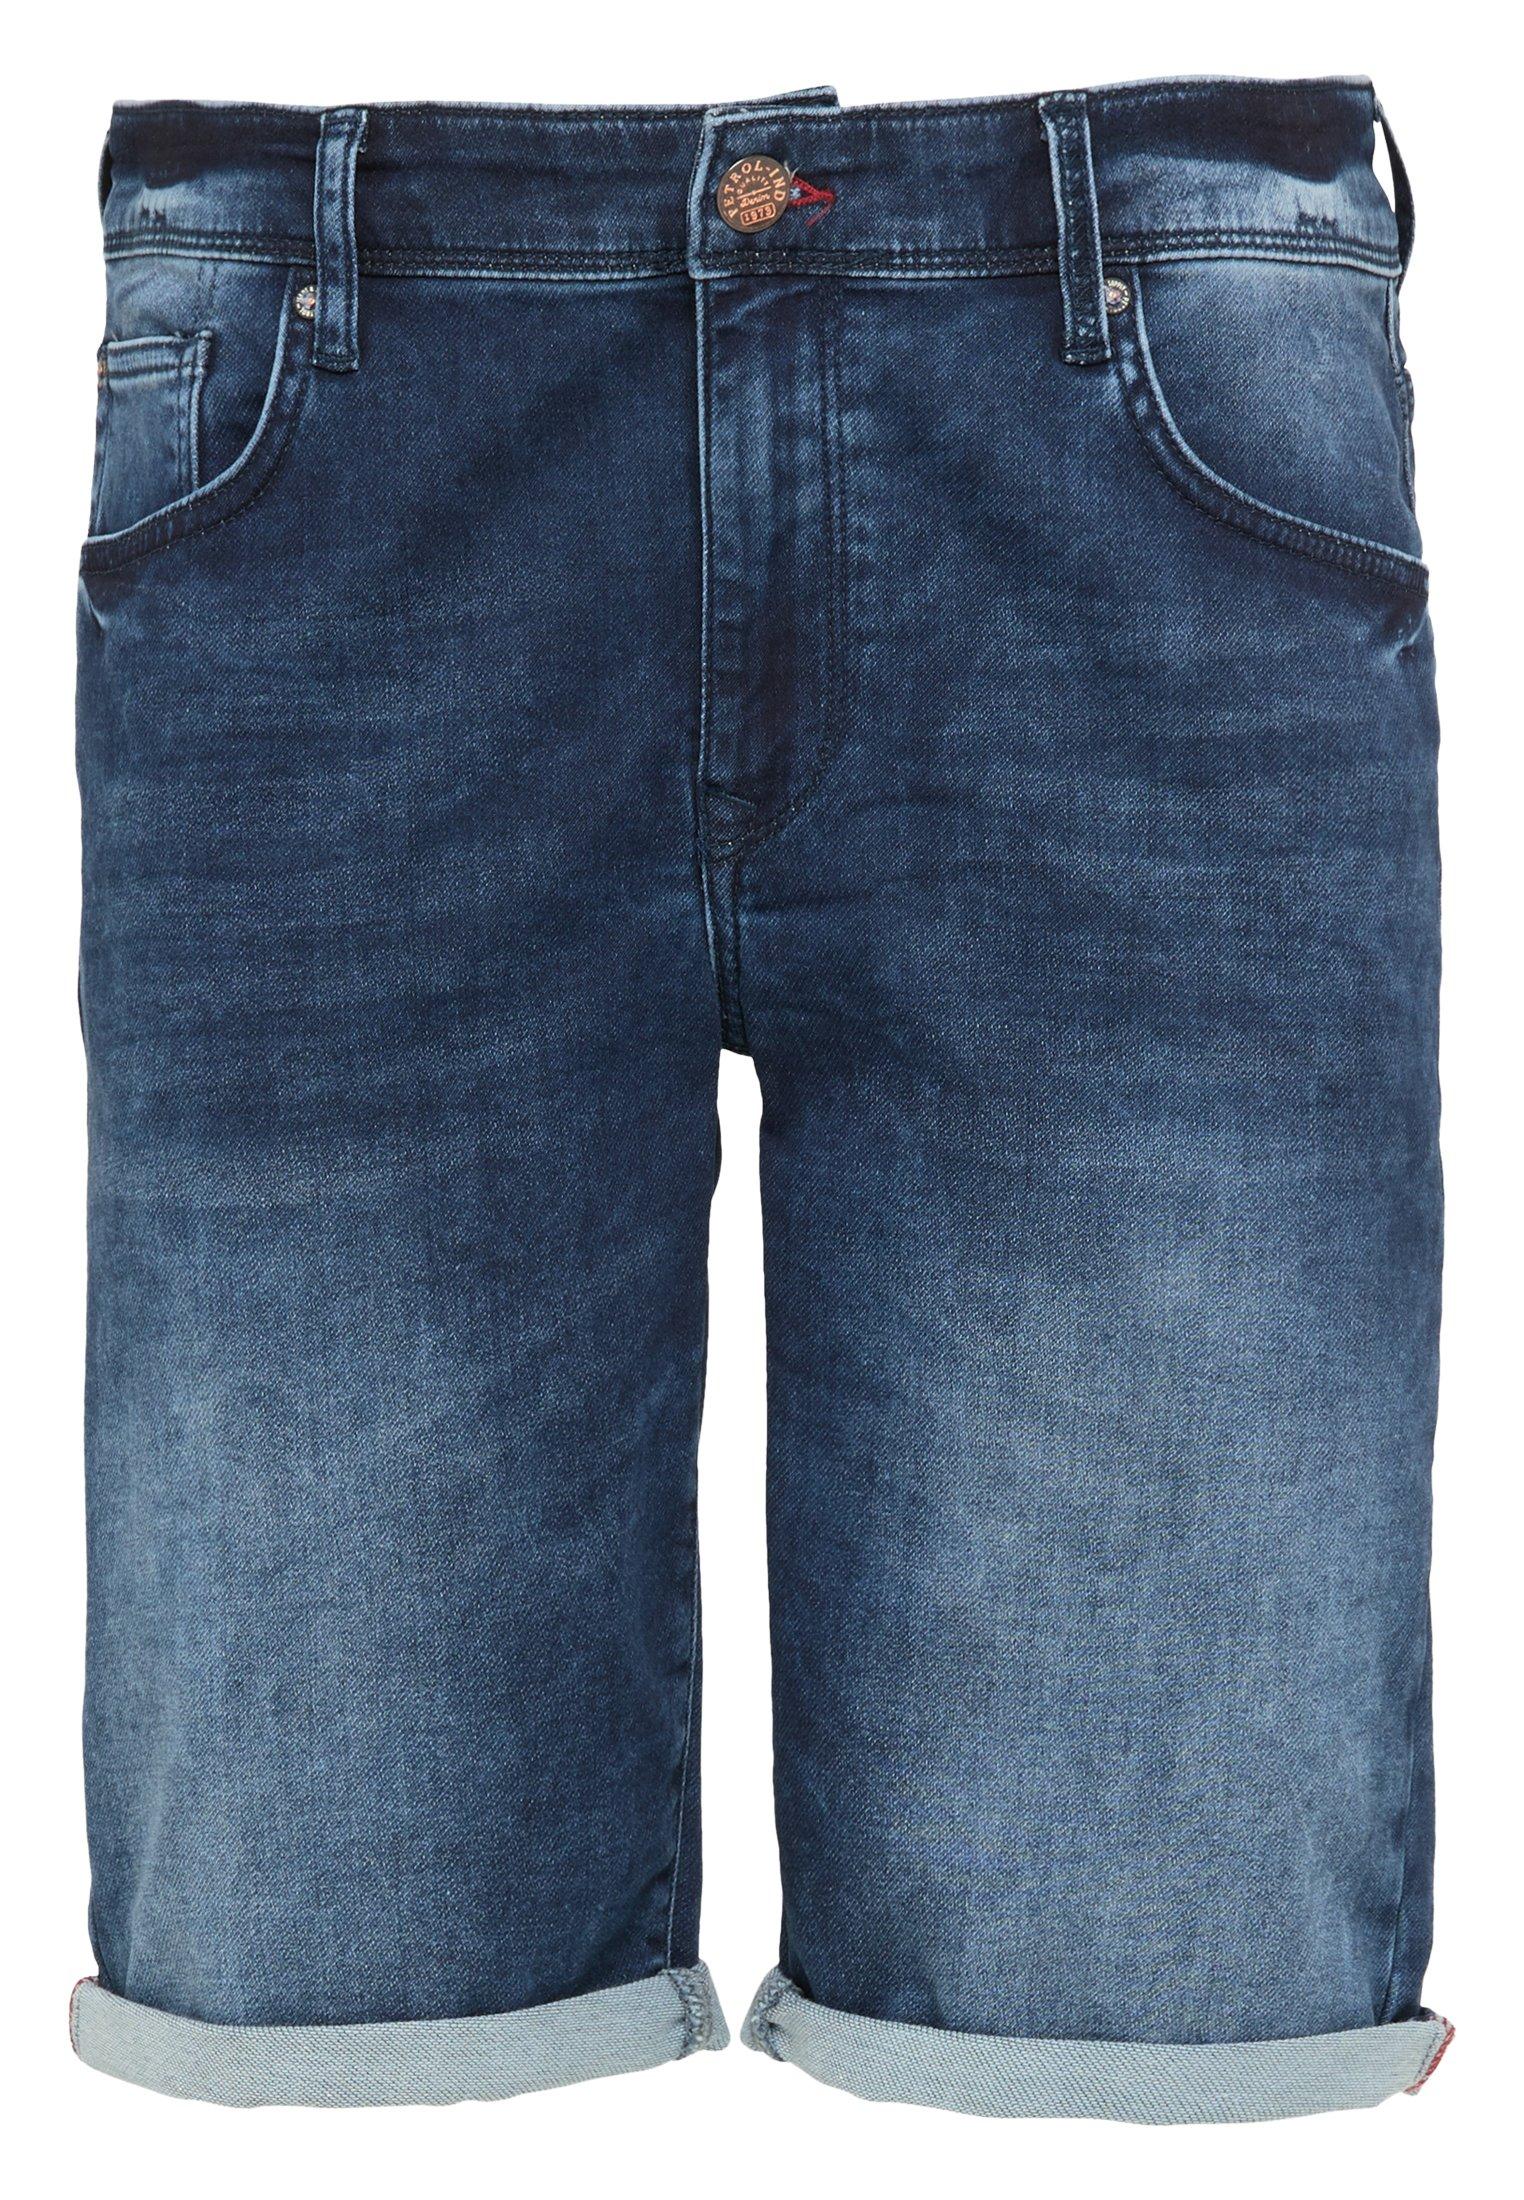 Petrol Industries Shorts - Jeans Black Stone